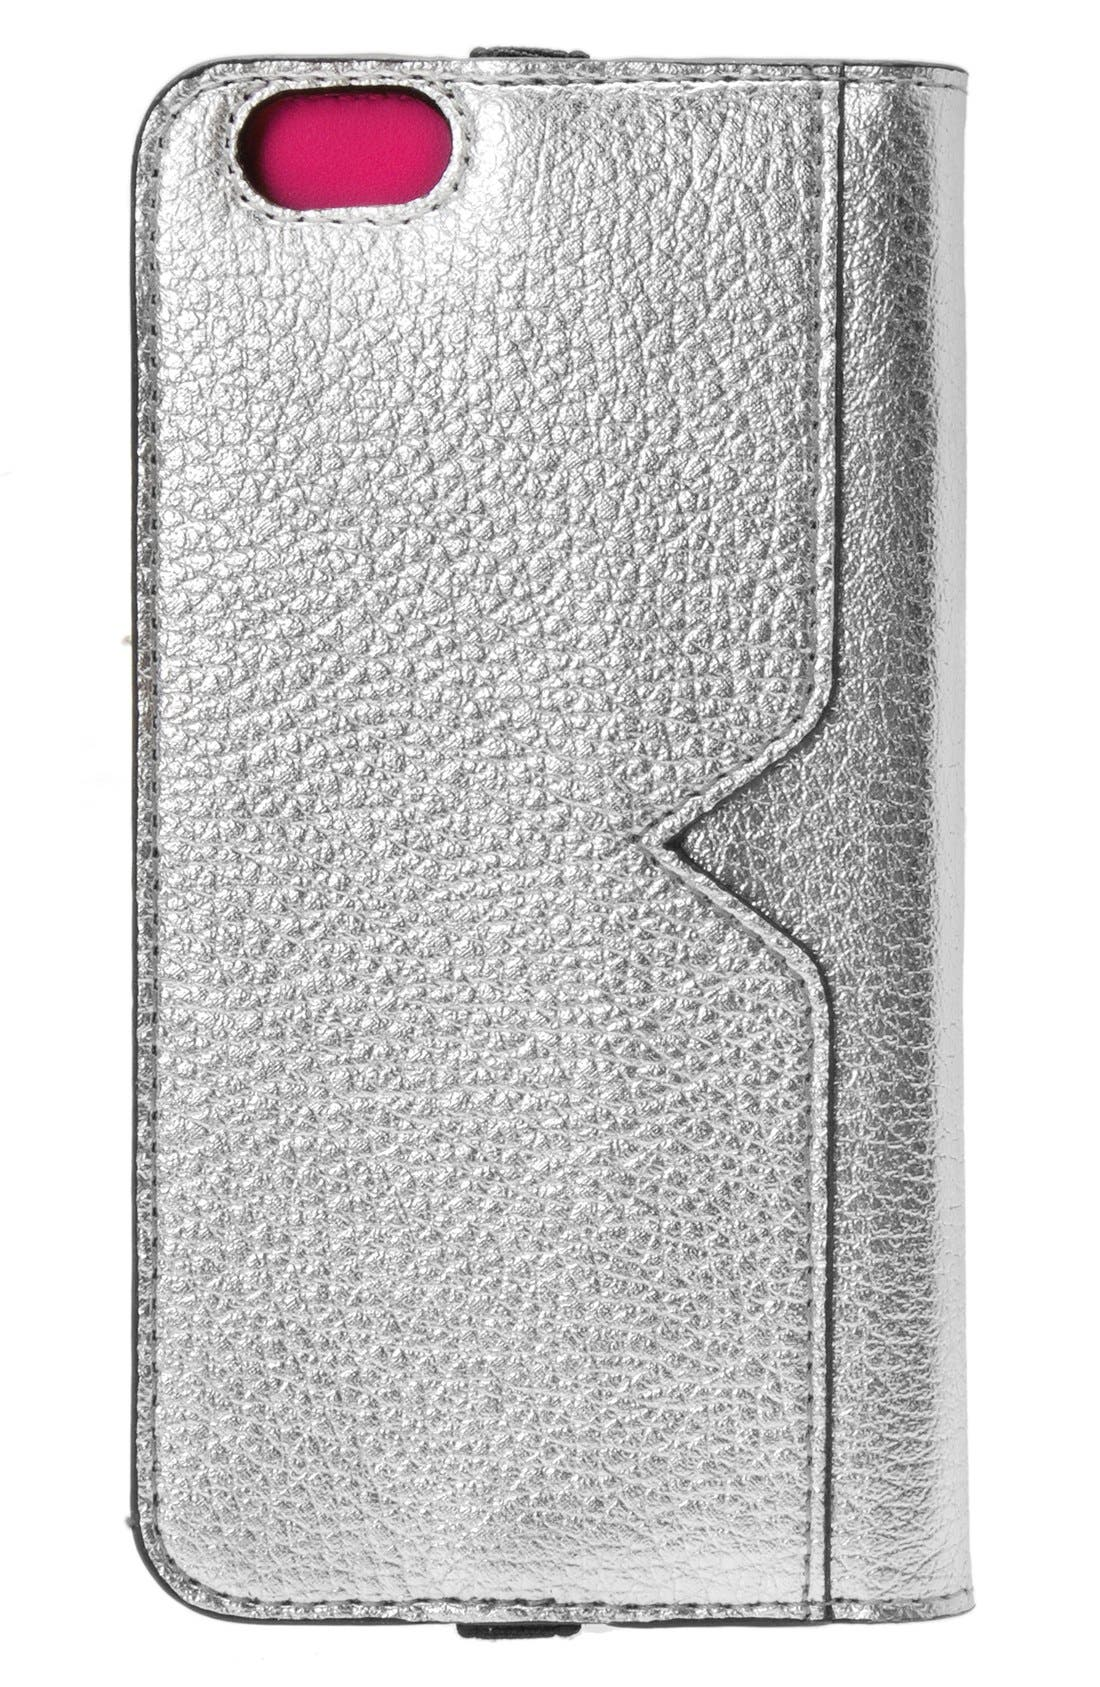 Alternate Image 2  - Mobileluxe iPhone 6/6s Metallic Leather Wallet Case